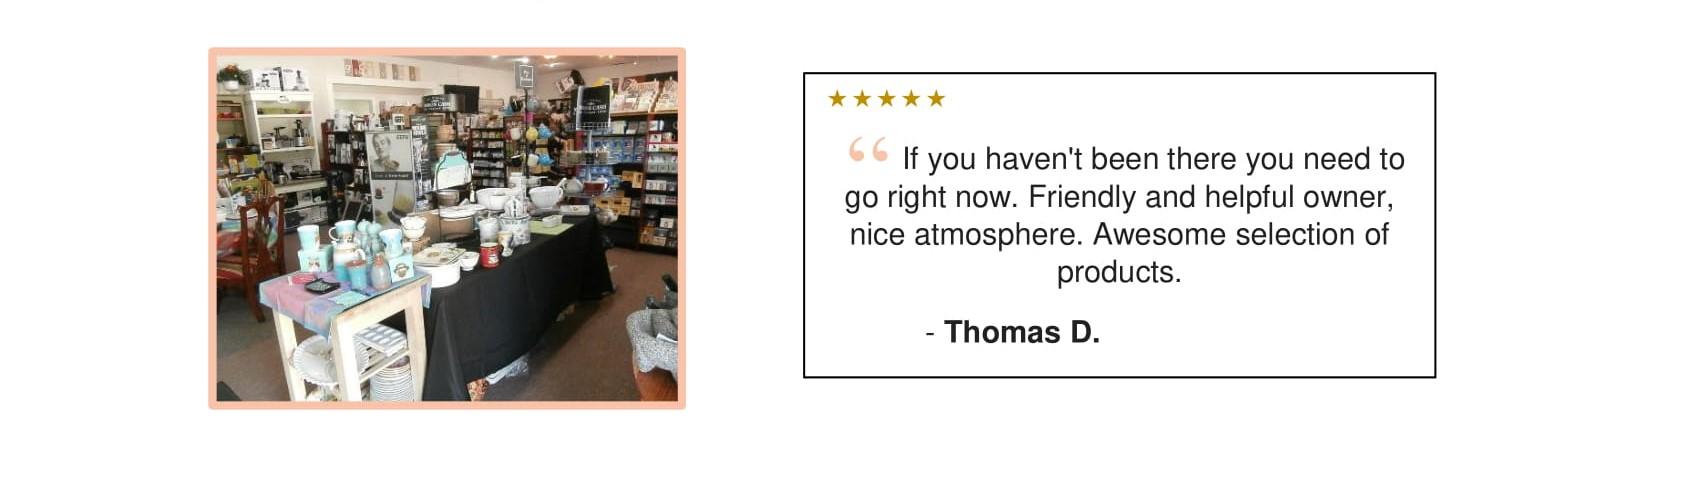 customer-testimonial-1.jpg